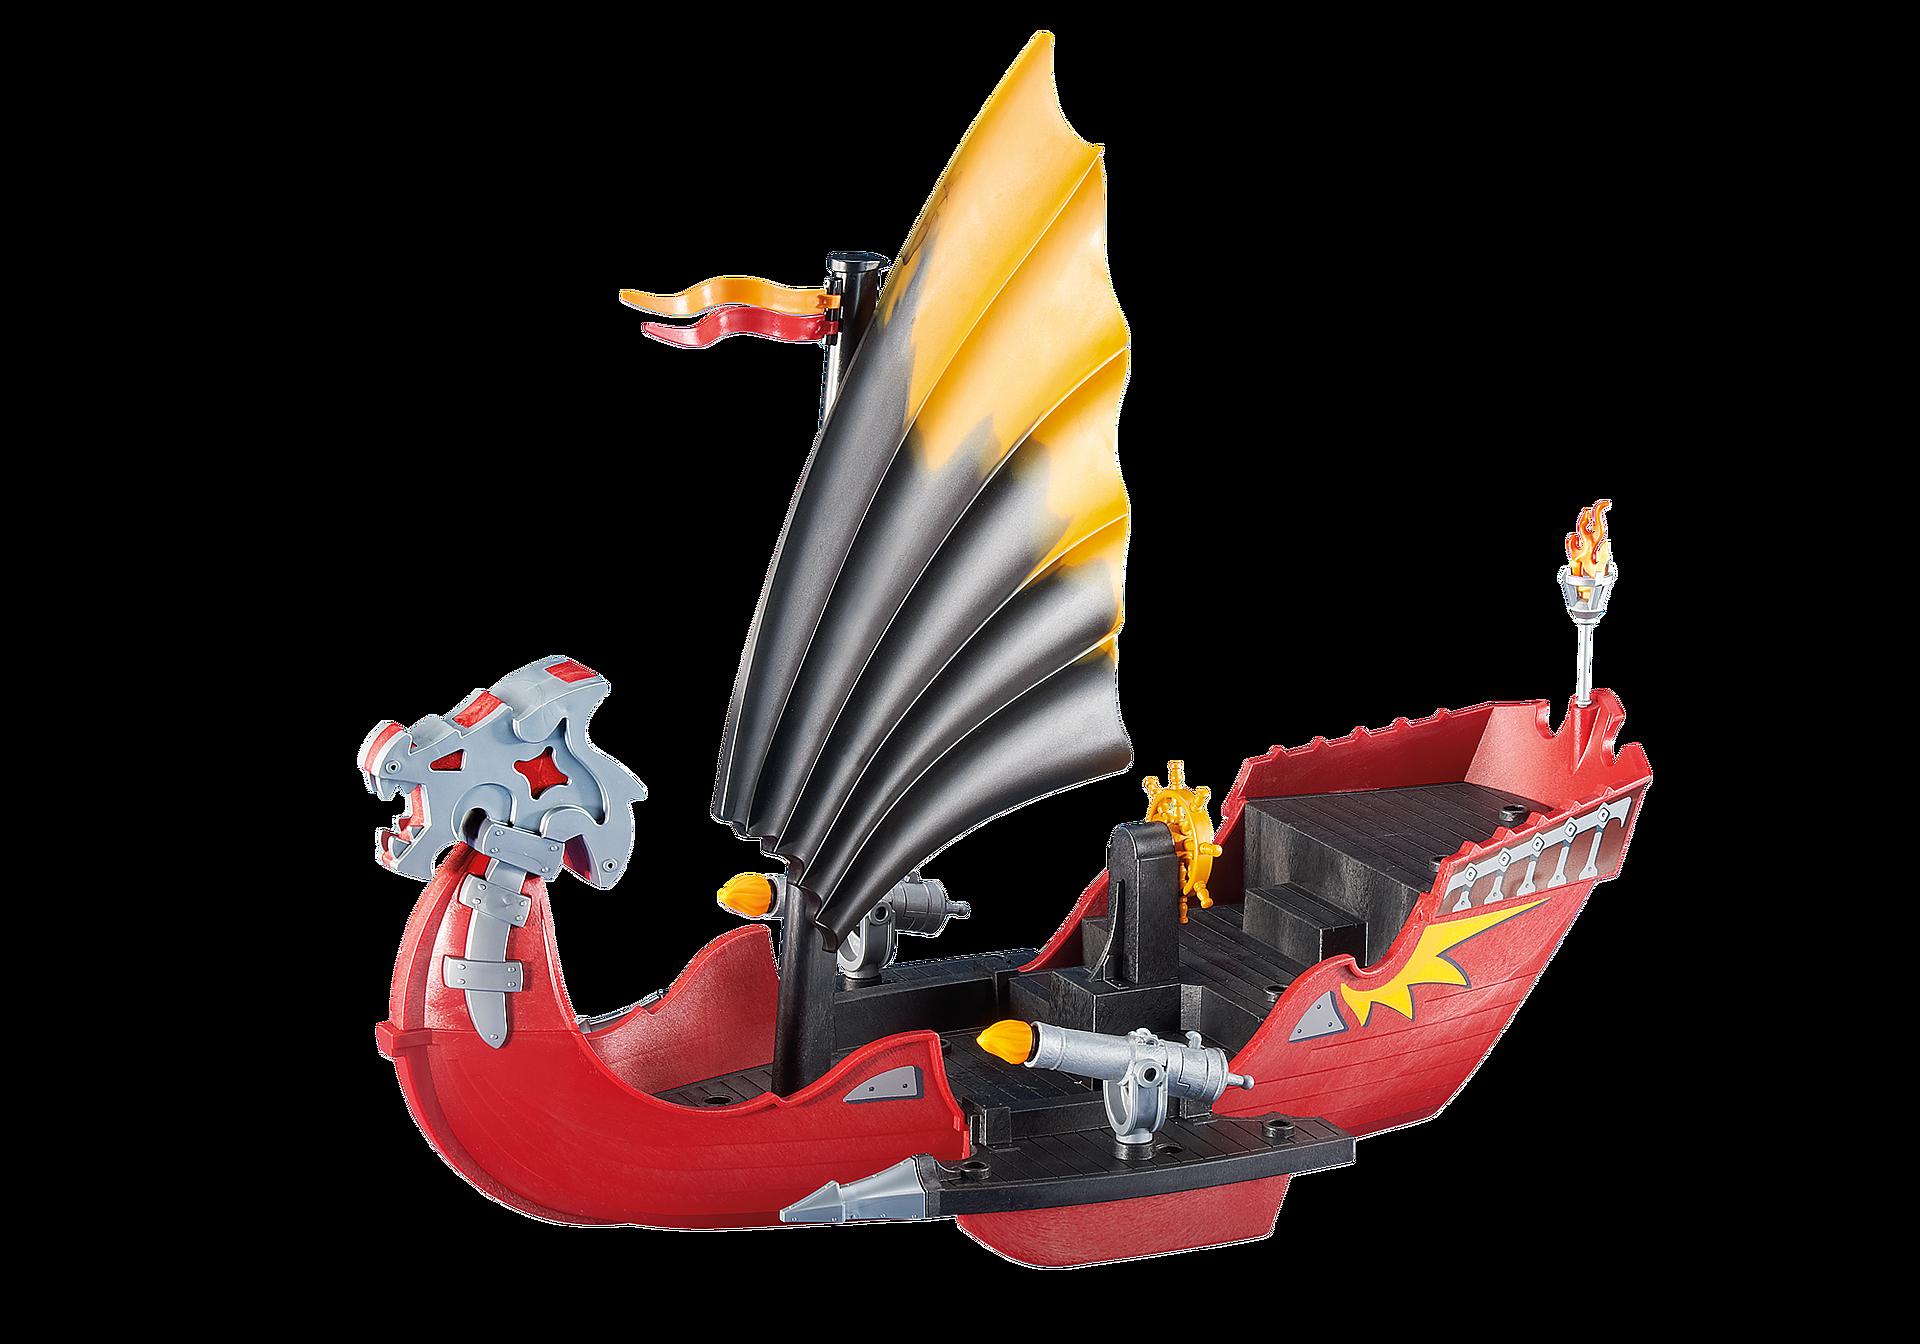 6497 Drachen-Kampfschiff zoom image1